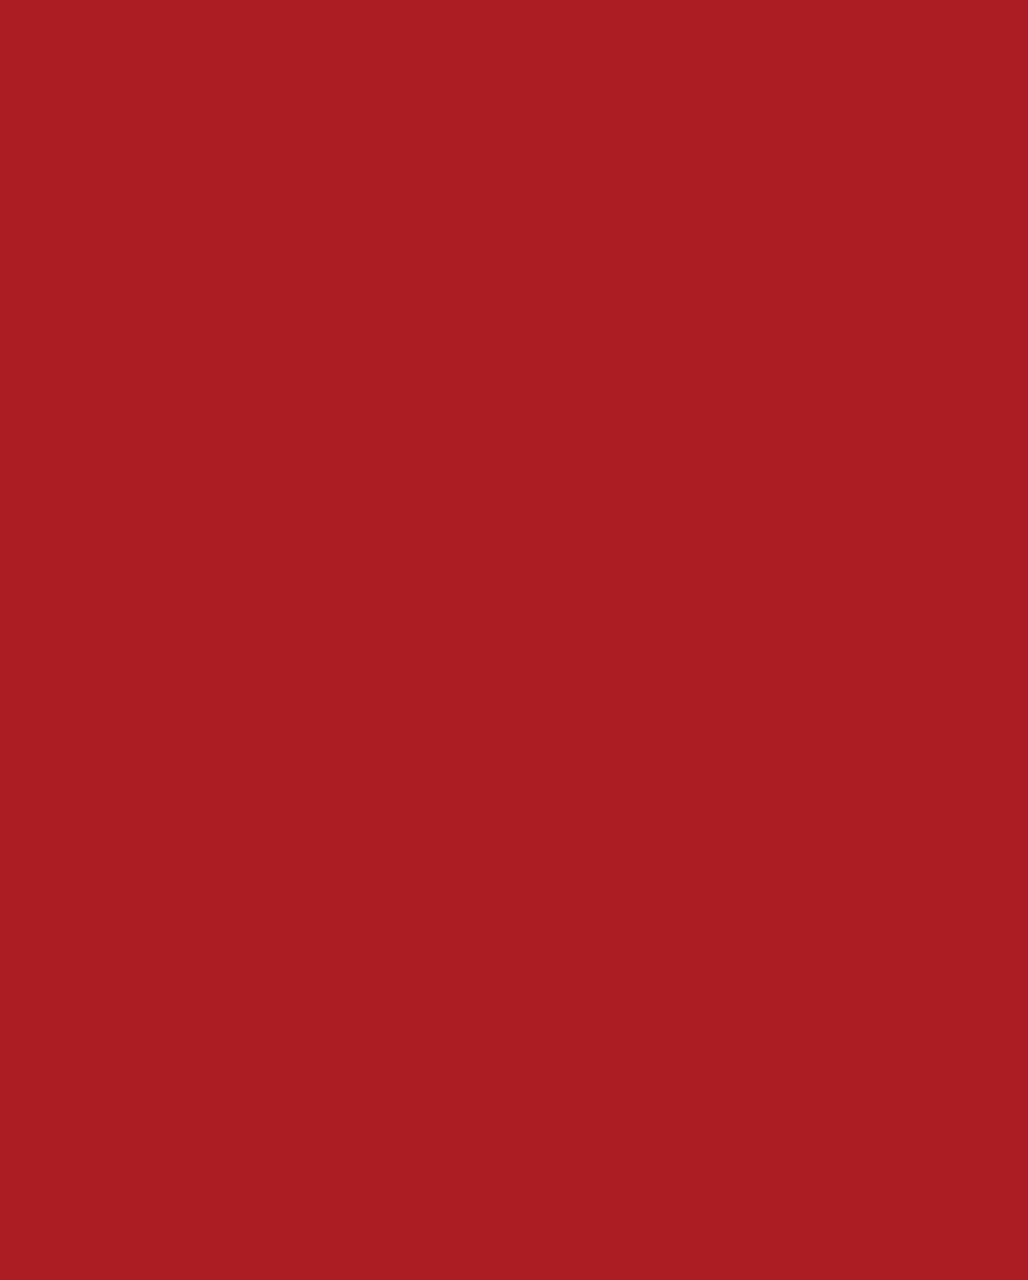 7113 Chilli Red (MF PB sample)